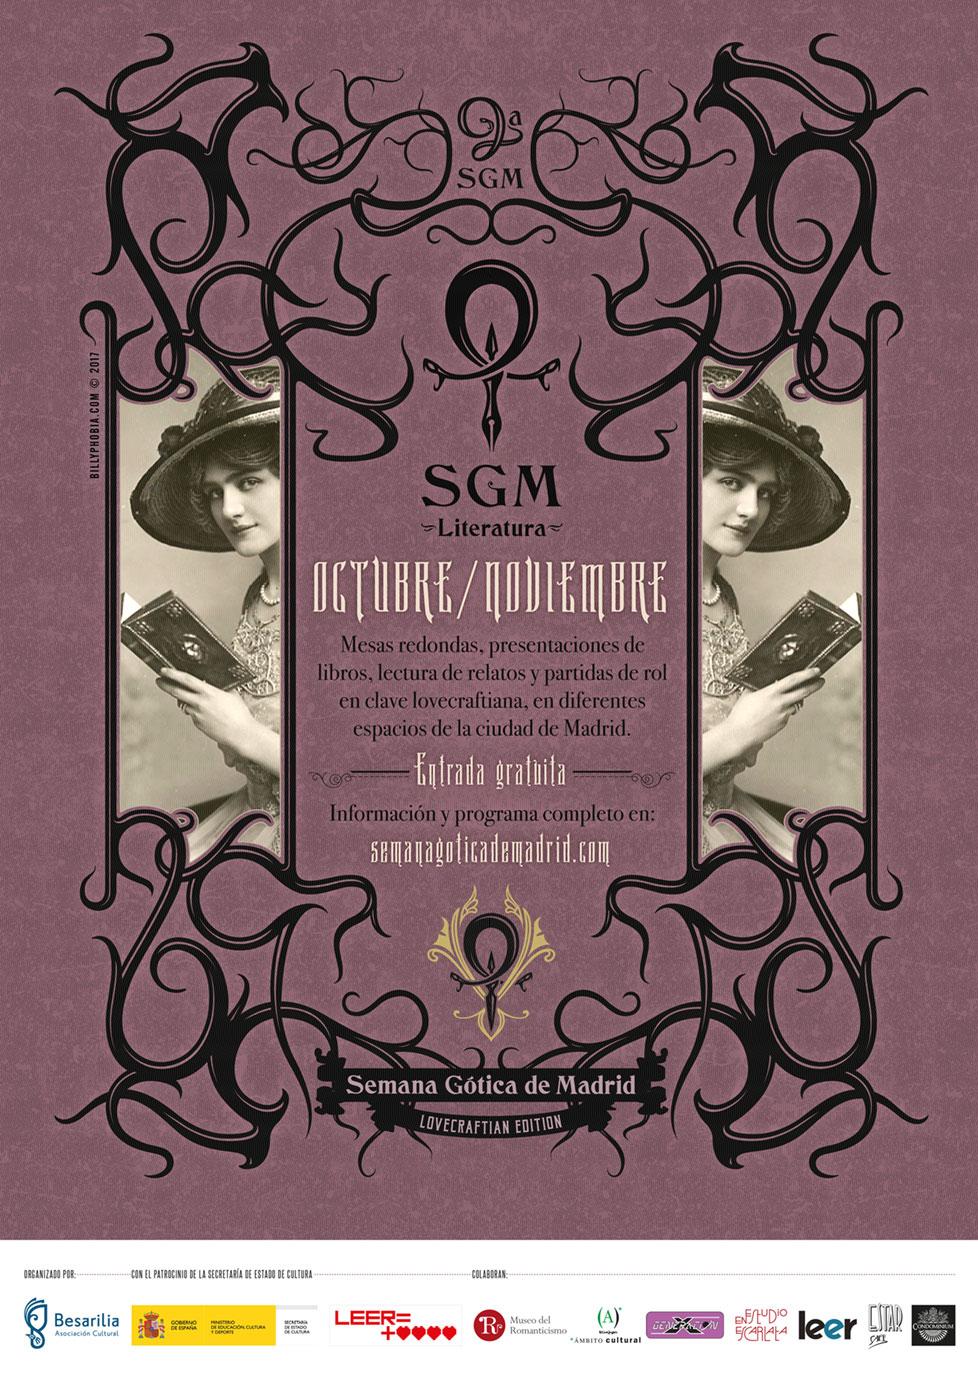 SGM Literatura - 9ª Semana Gótica de Madrid - Cartel de Billyphobia © 2017